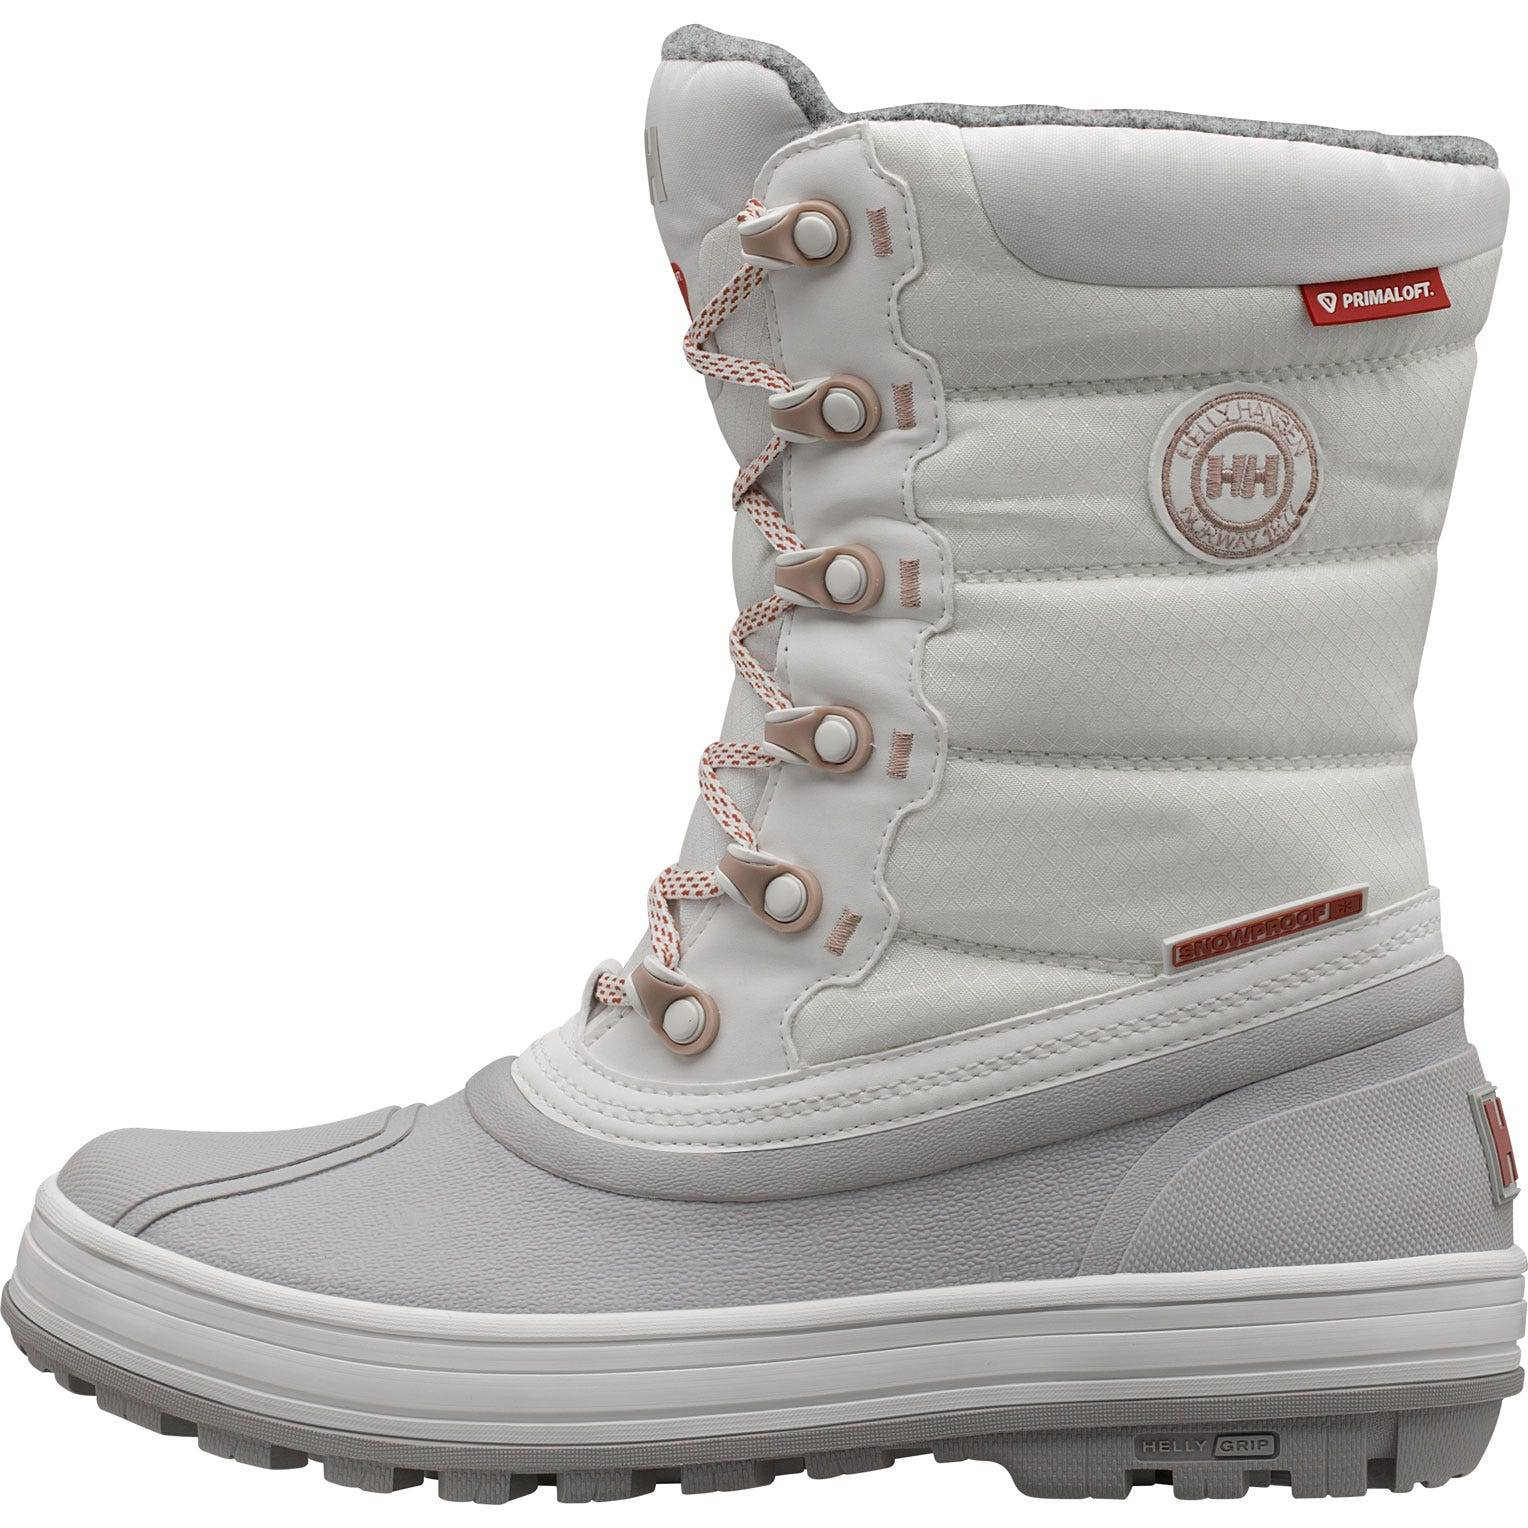 Helly Hansen W Tundra Cwb Womens Winter Boot White 40.5/9